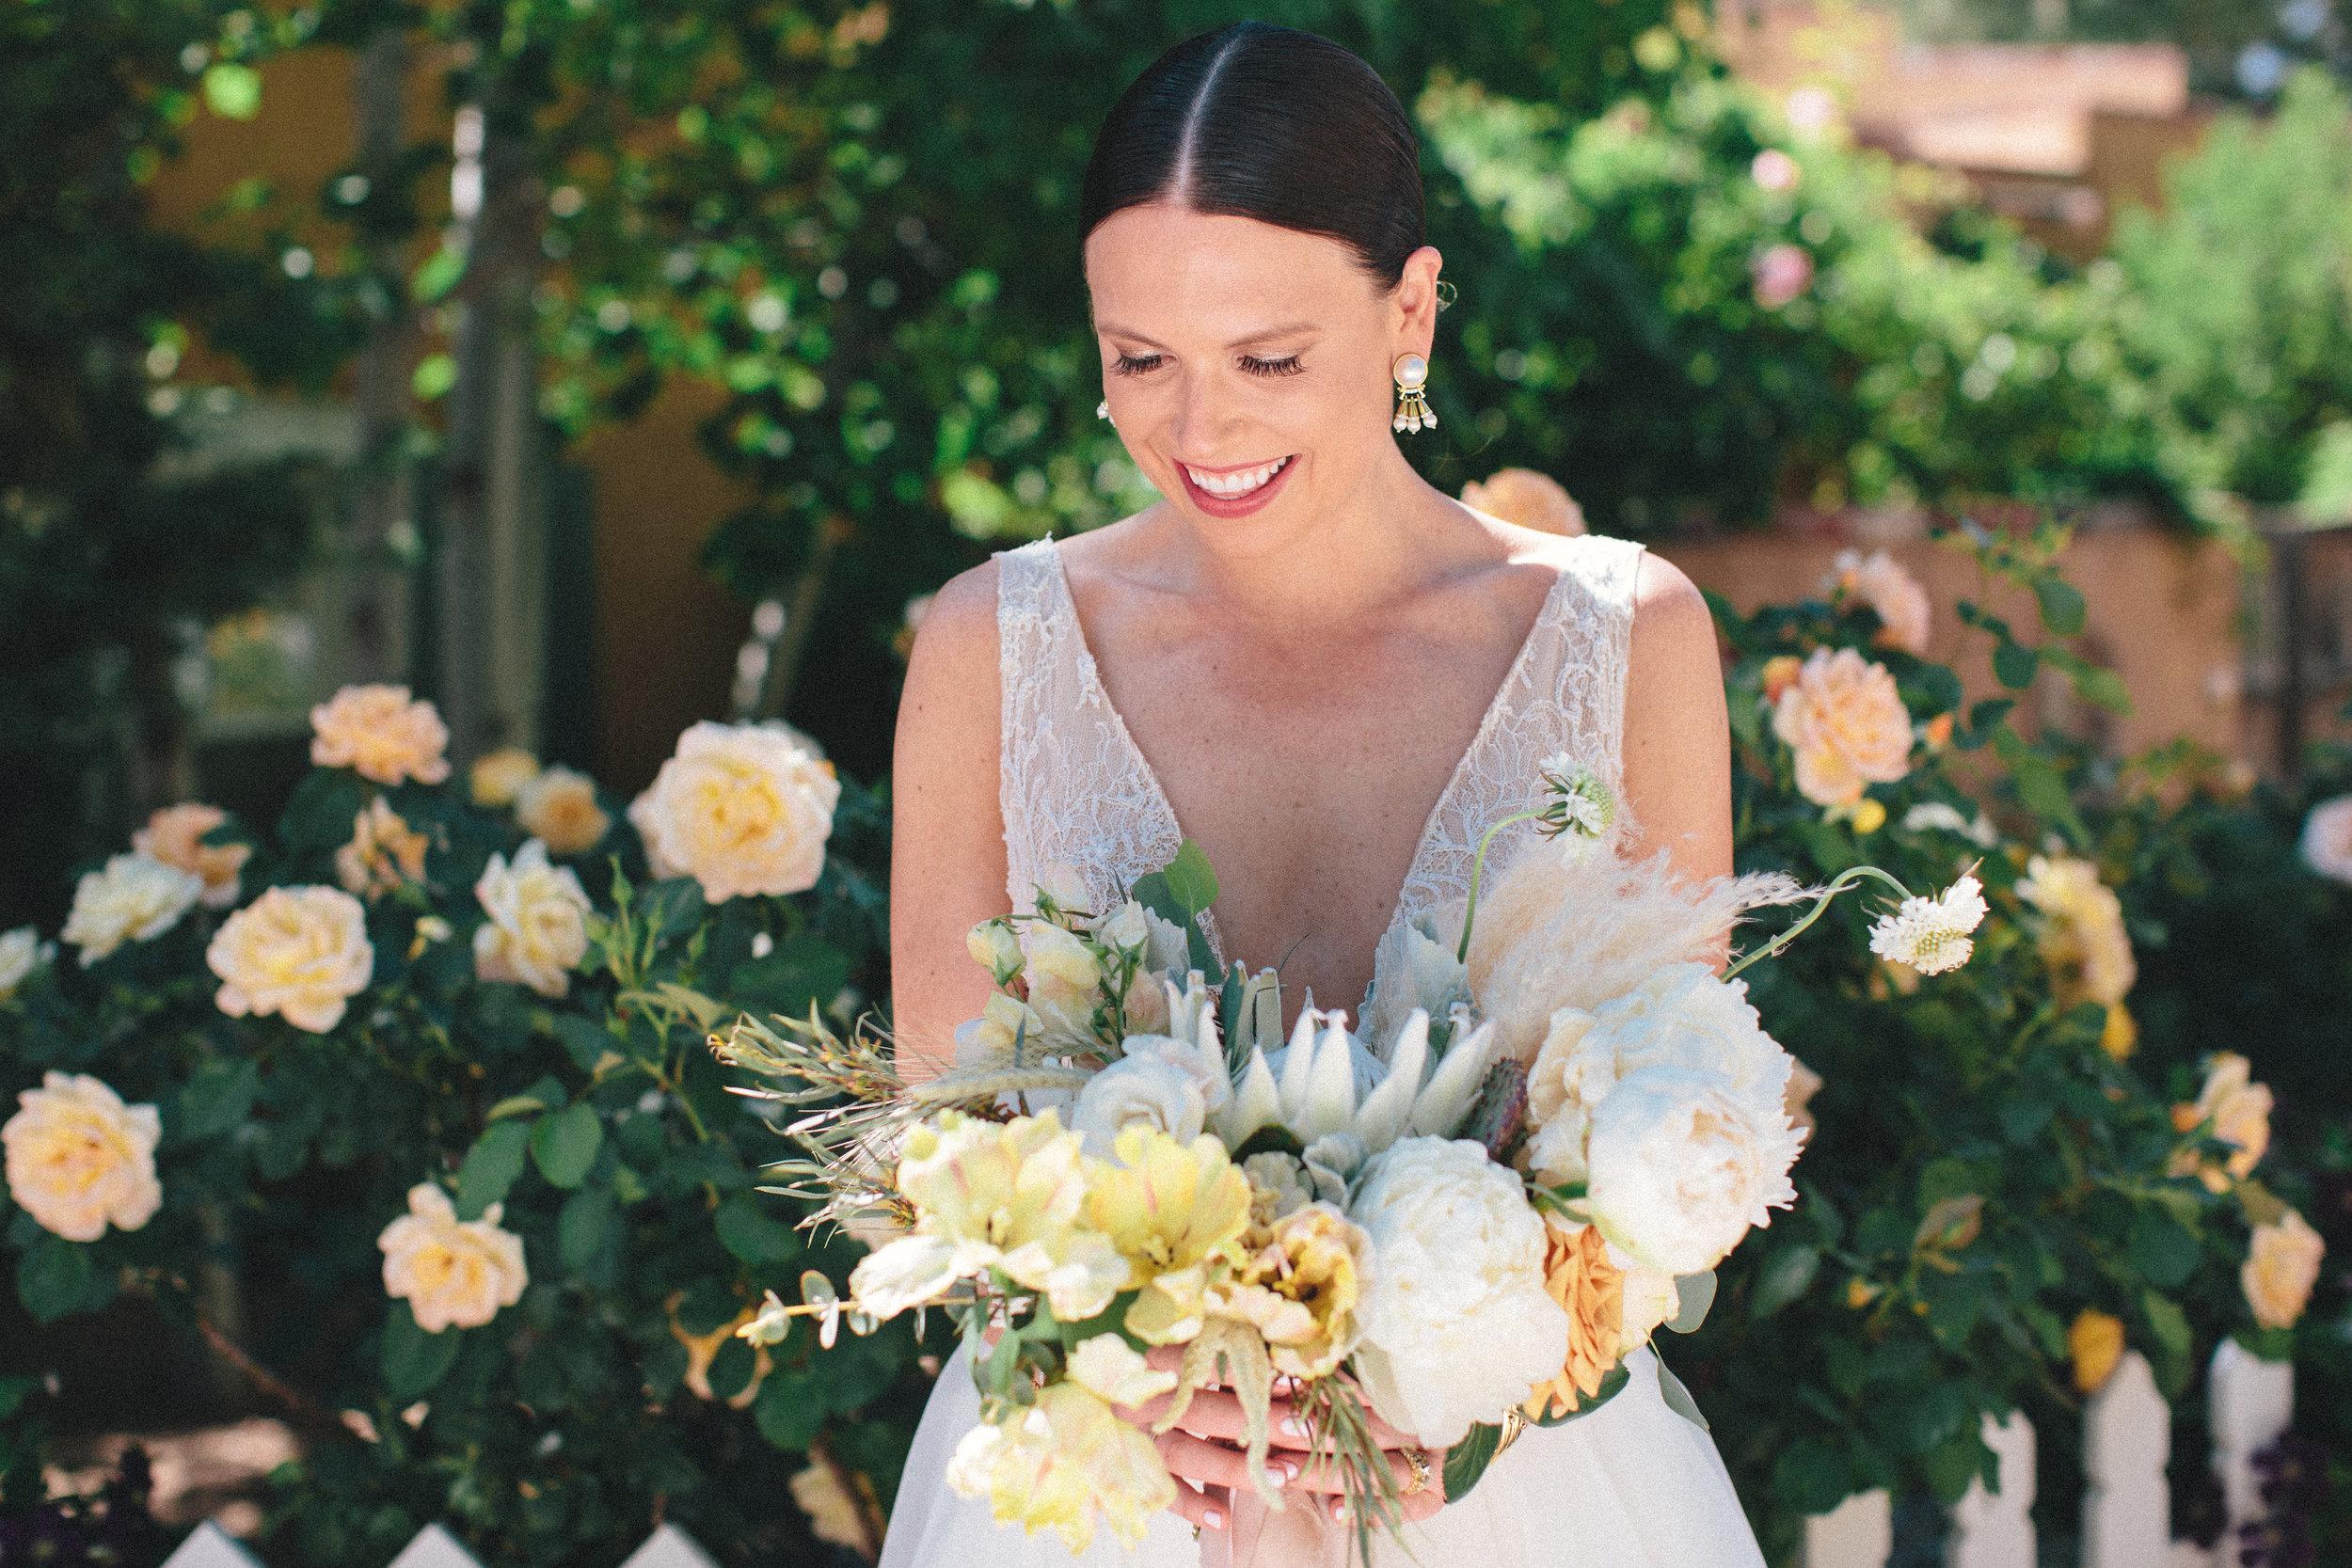 landry_lovelace_wedding_jbobephoto-184.jpg